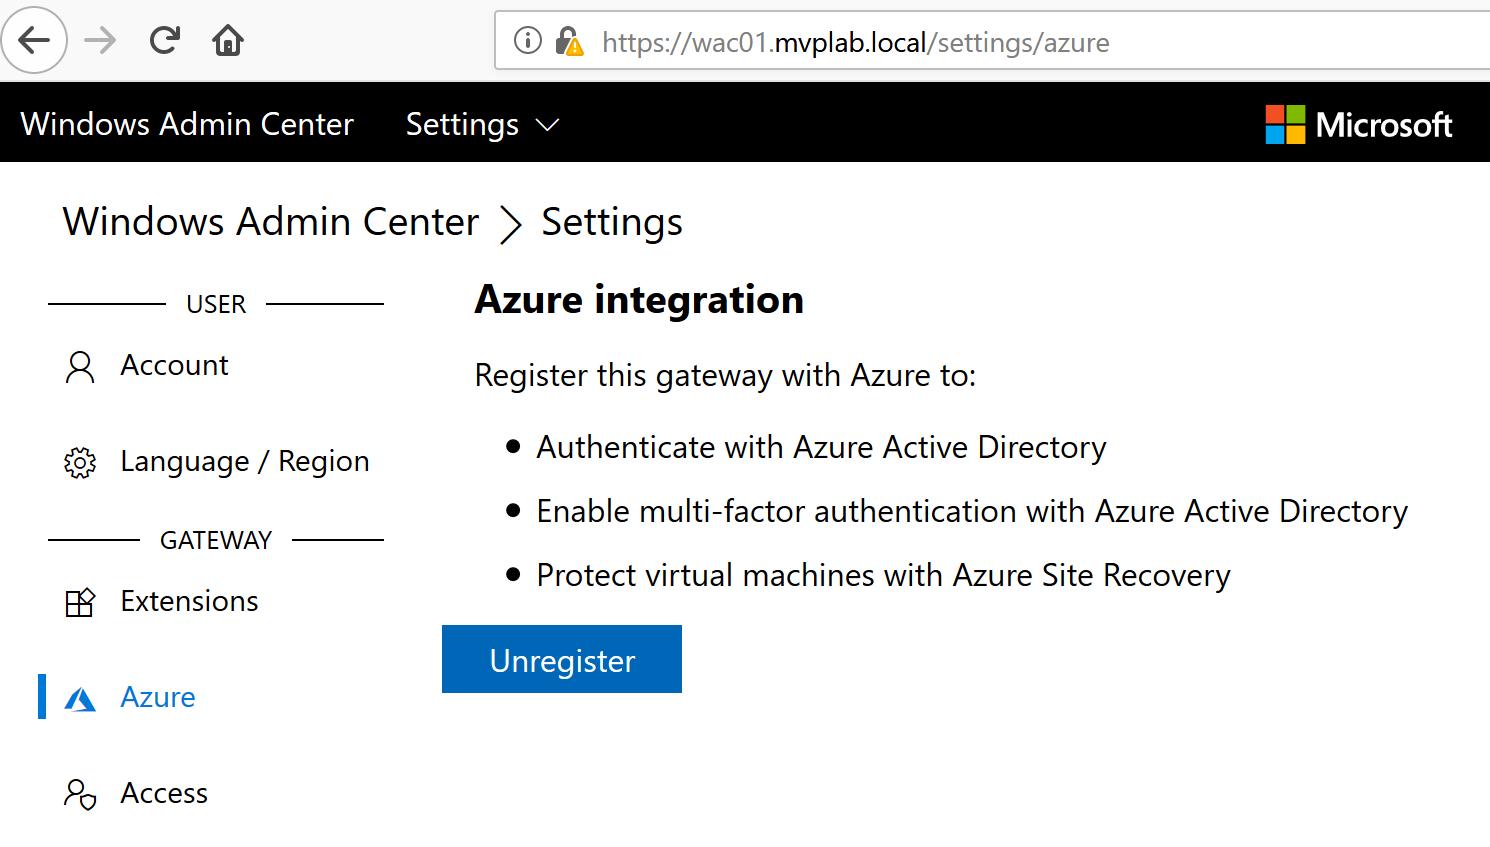 Connecting Windows Admin Center to #Microsoft Azure